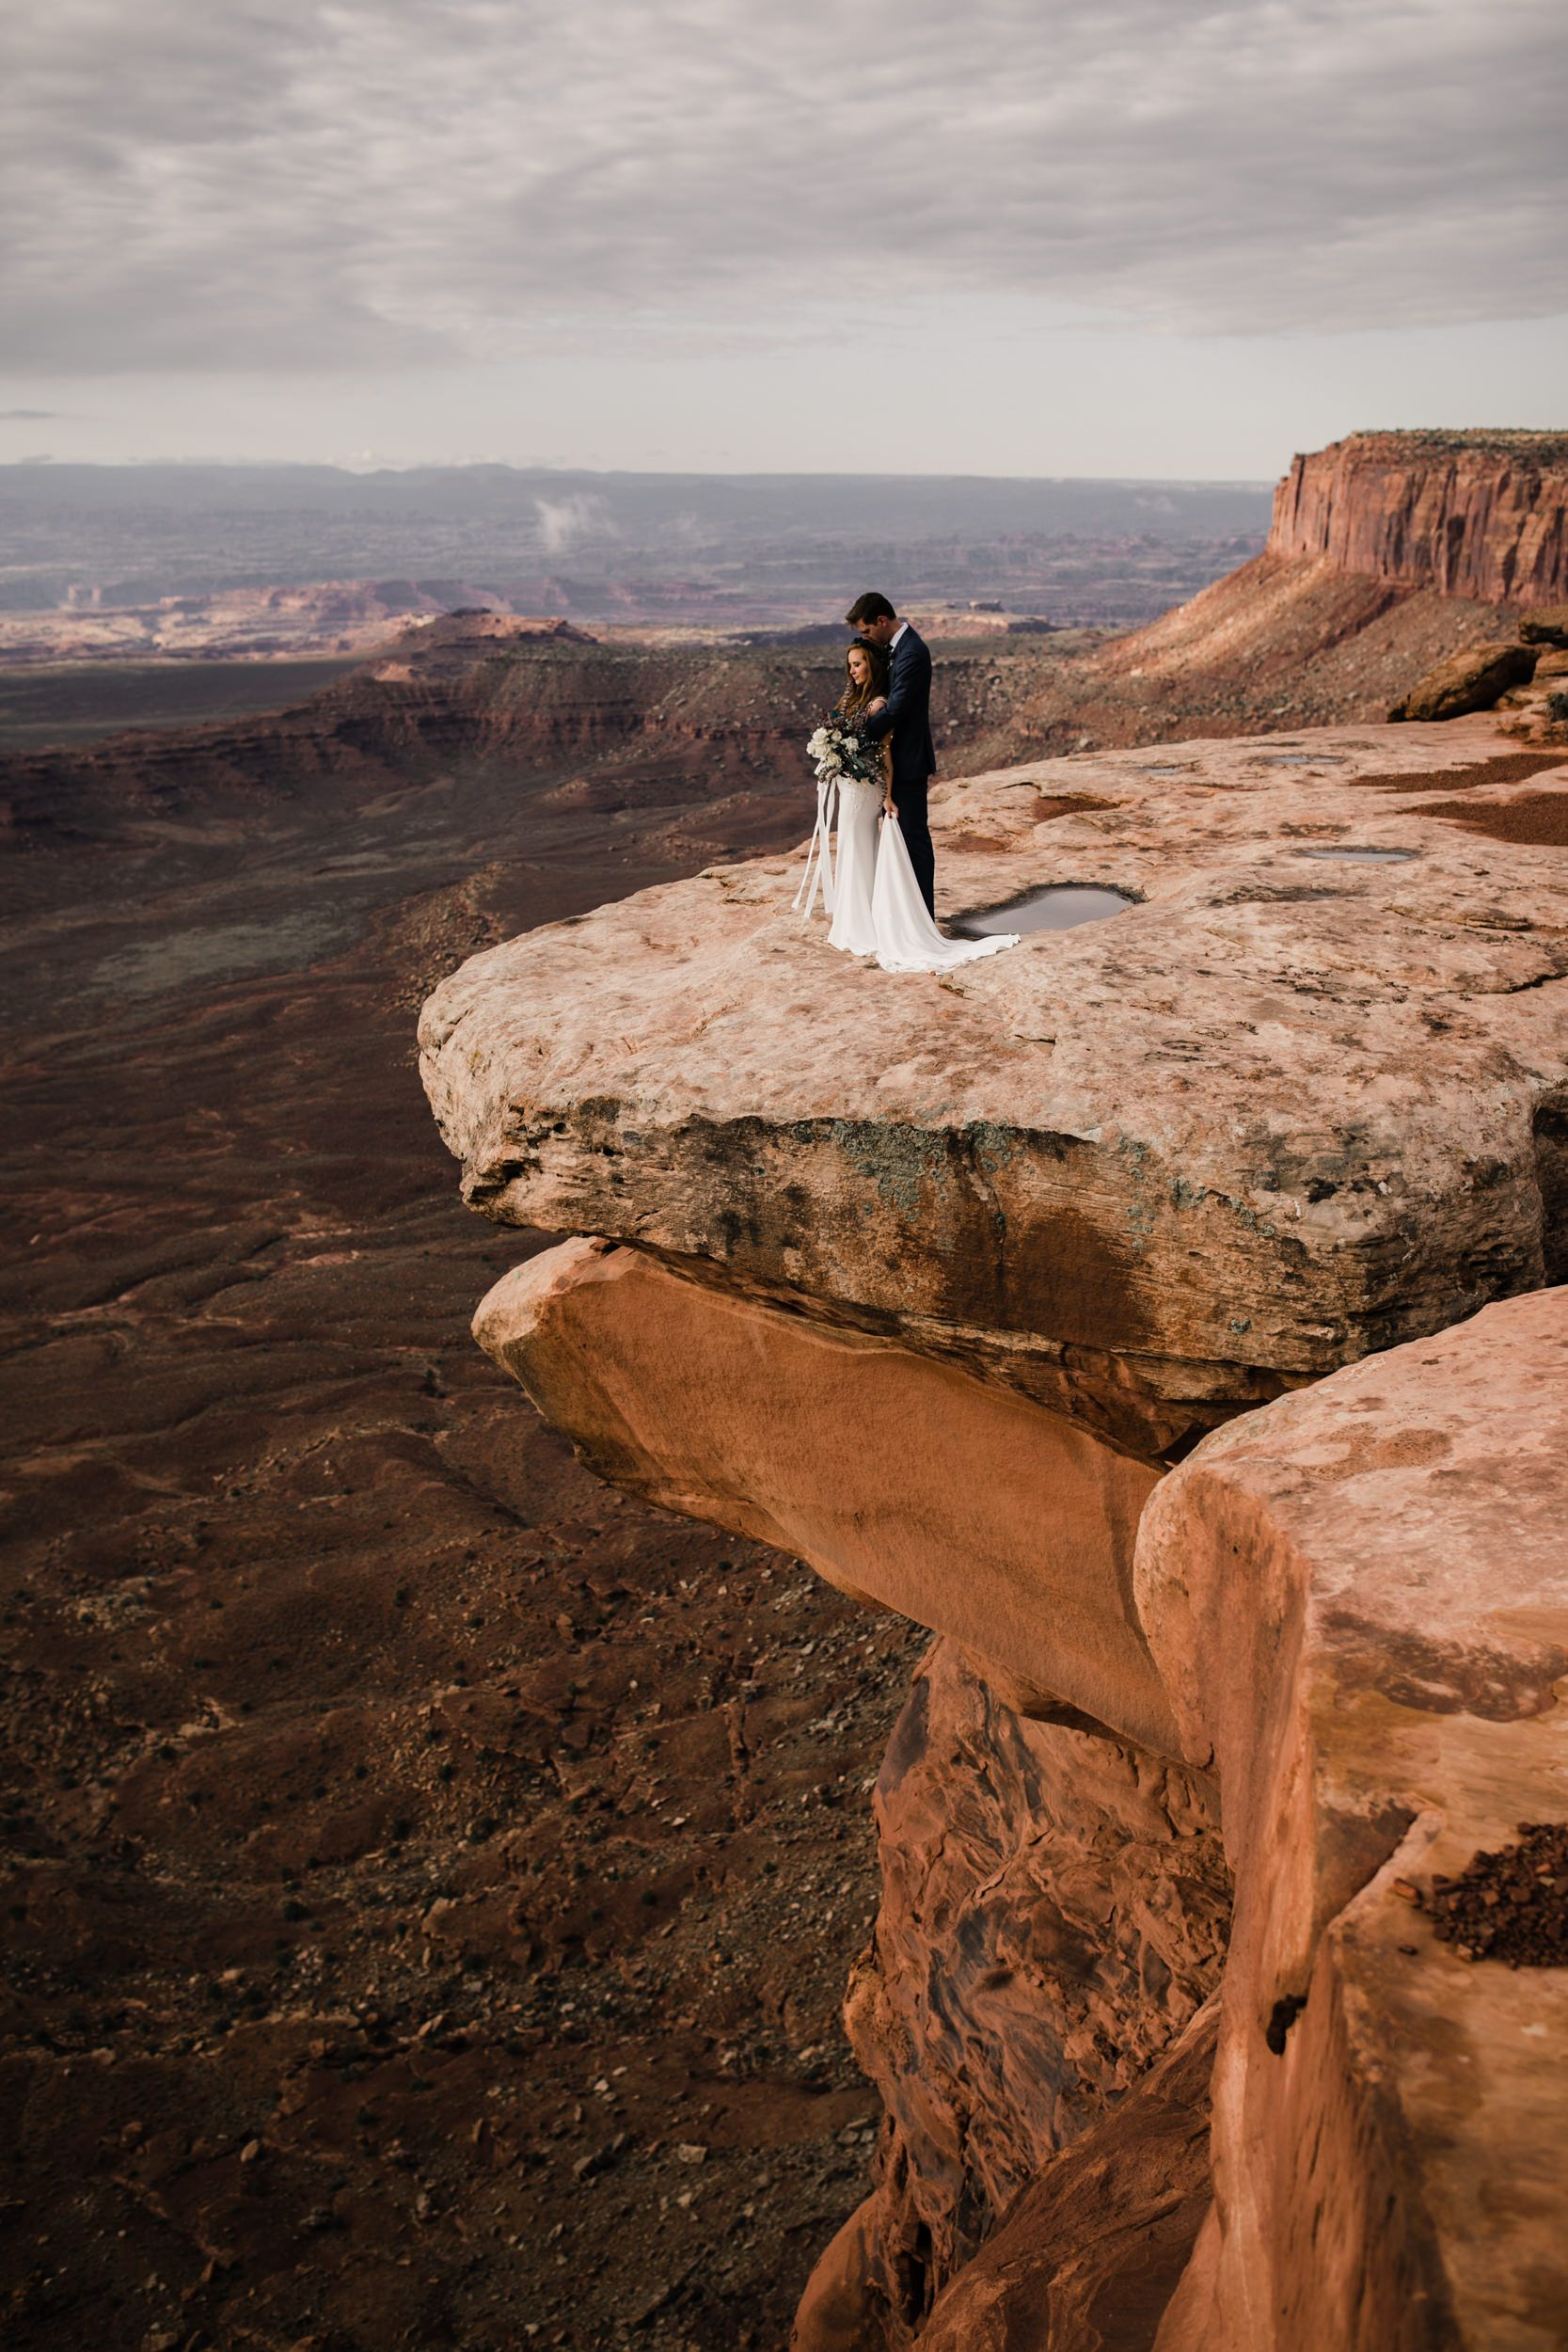 Cliffside Elopement In The Desert Adventure Wedding Photographer